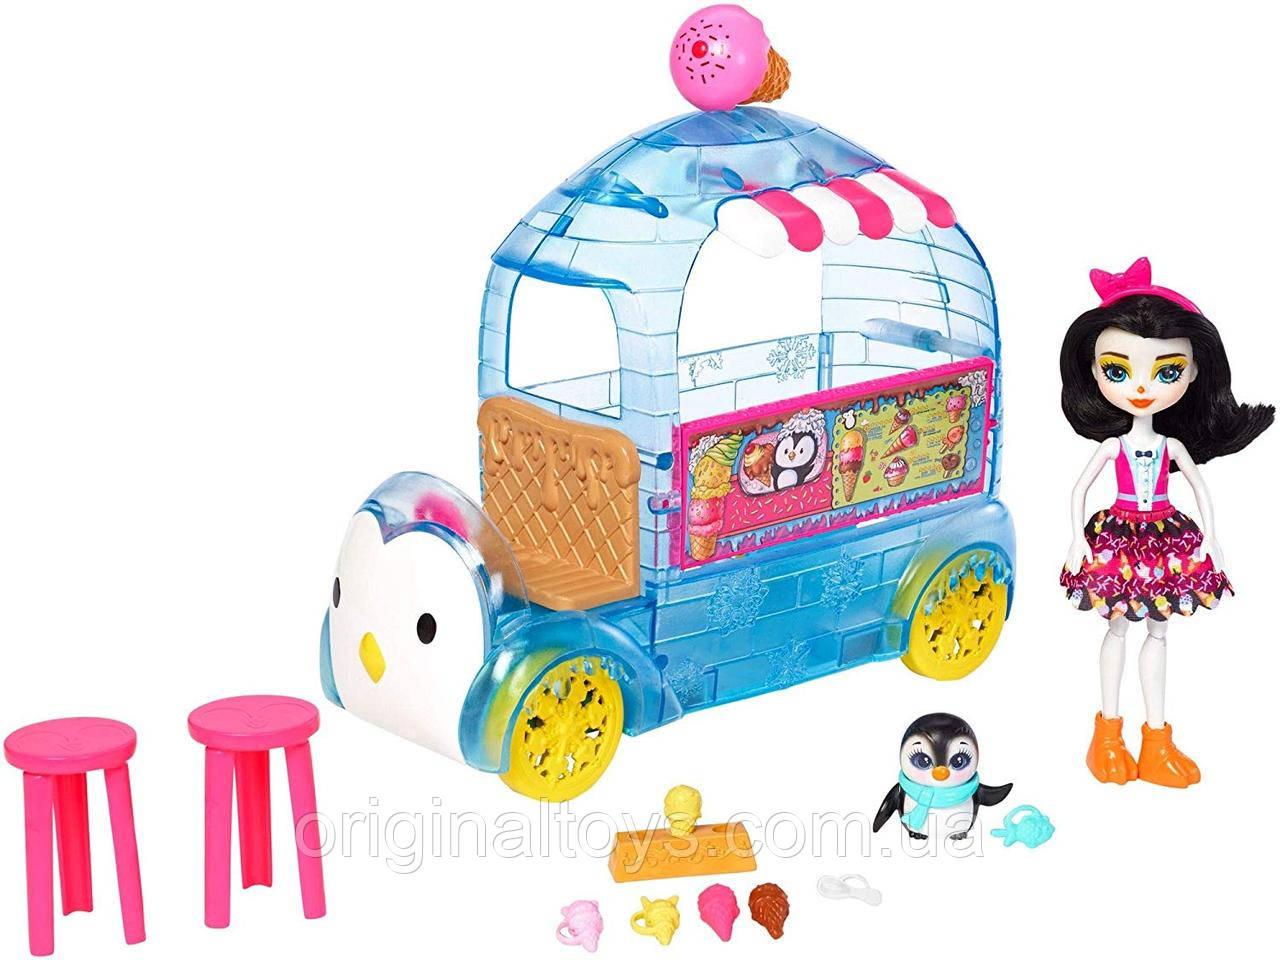 Набір Лялька Enchantimals Пріна Пінгвін Фургон з холодними ласощами Ice Cream Playset FKY58